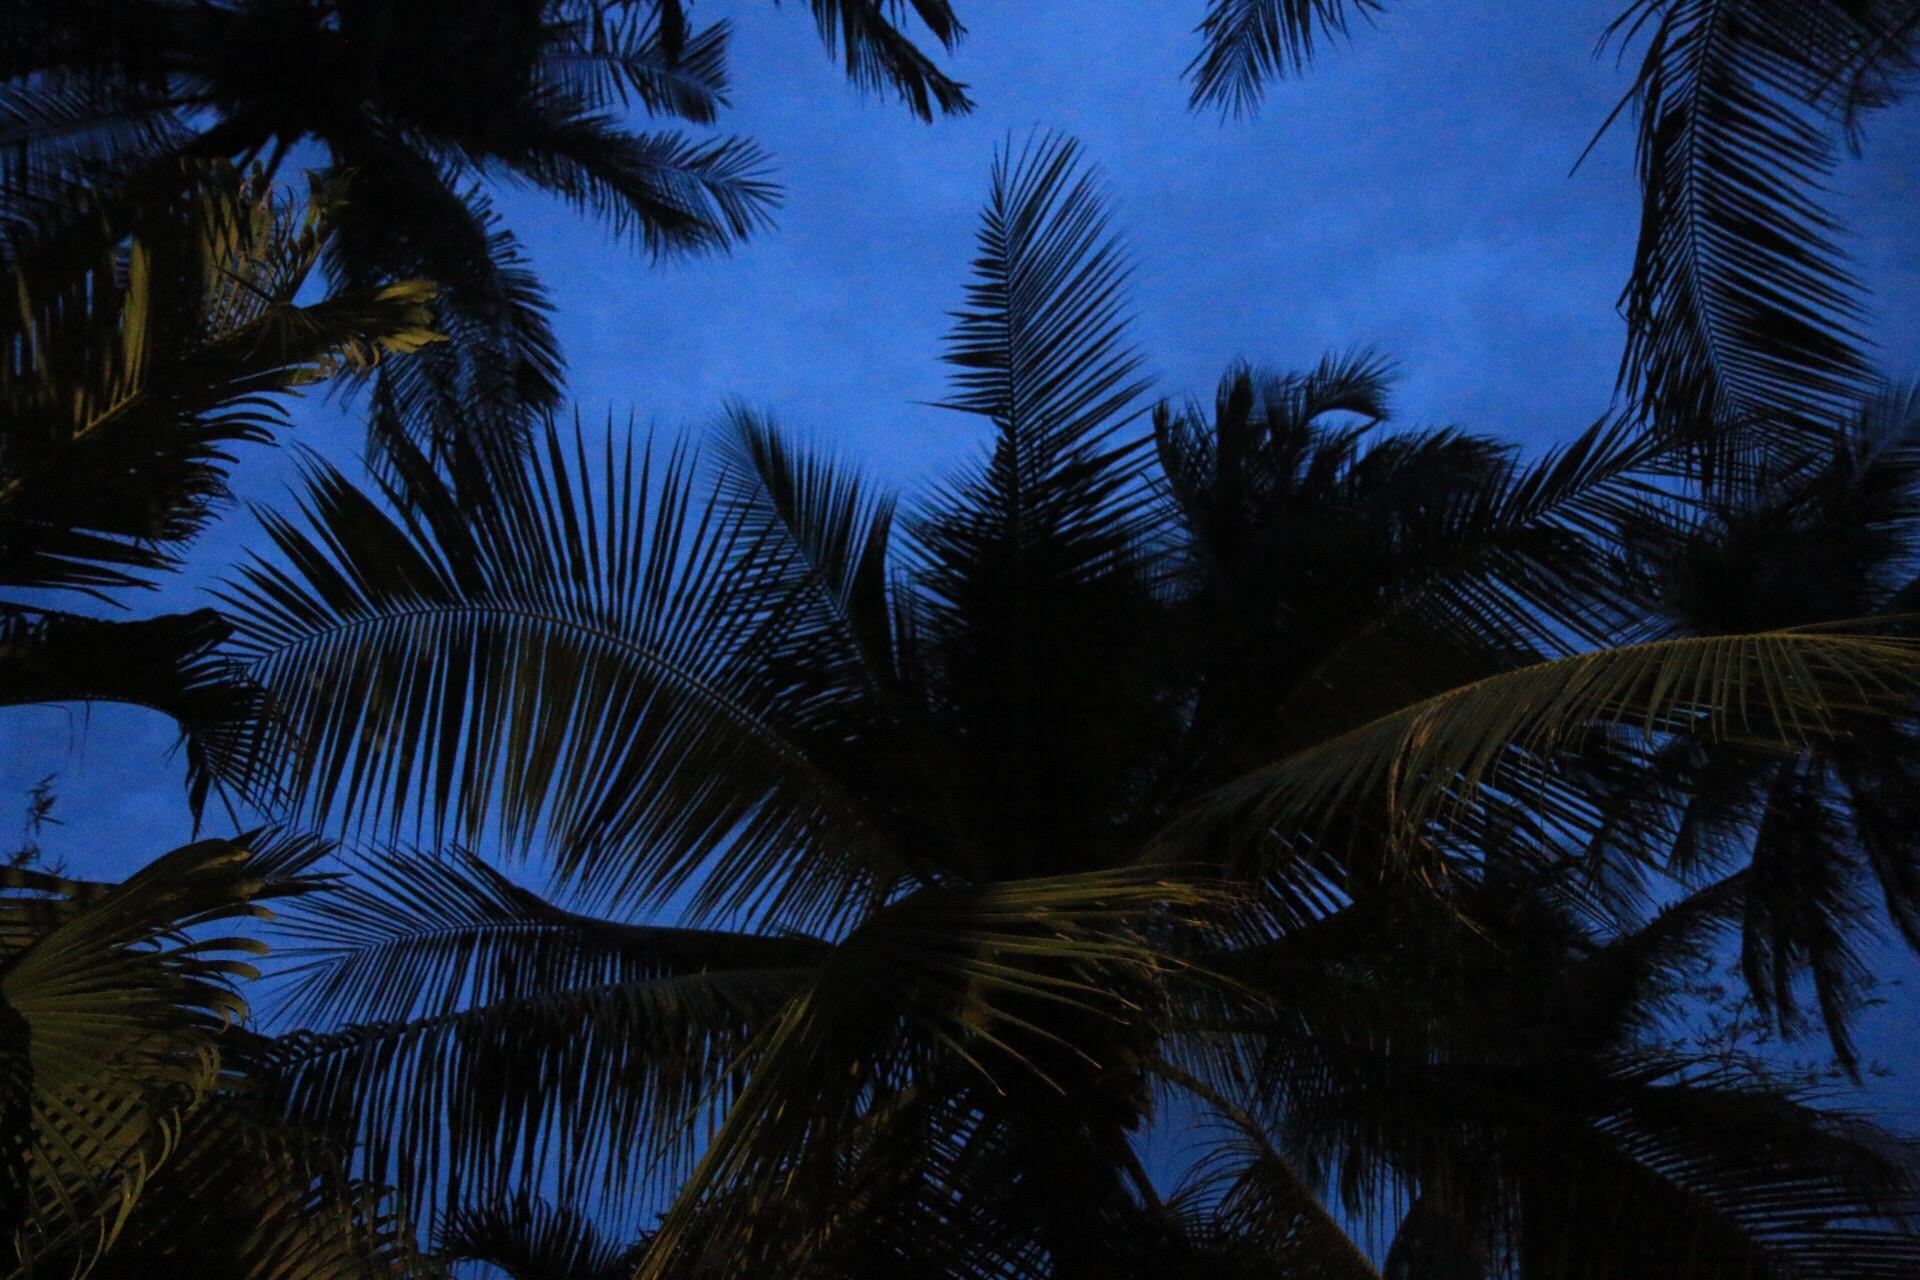 Mein Fensterausblick - der Blick in die Palmenwipel.